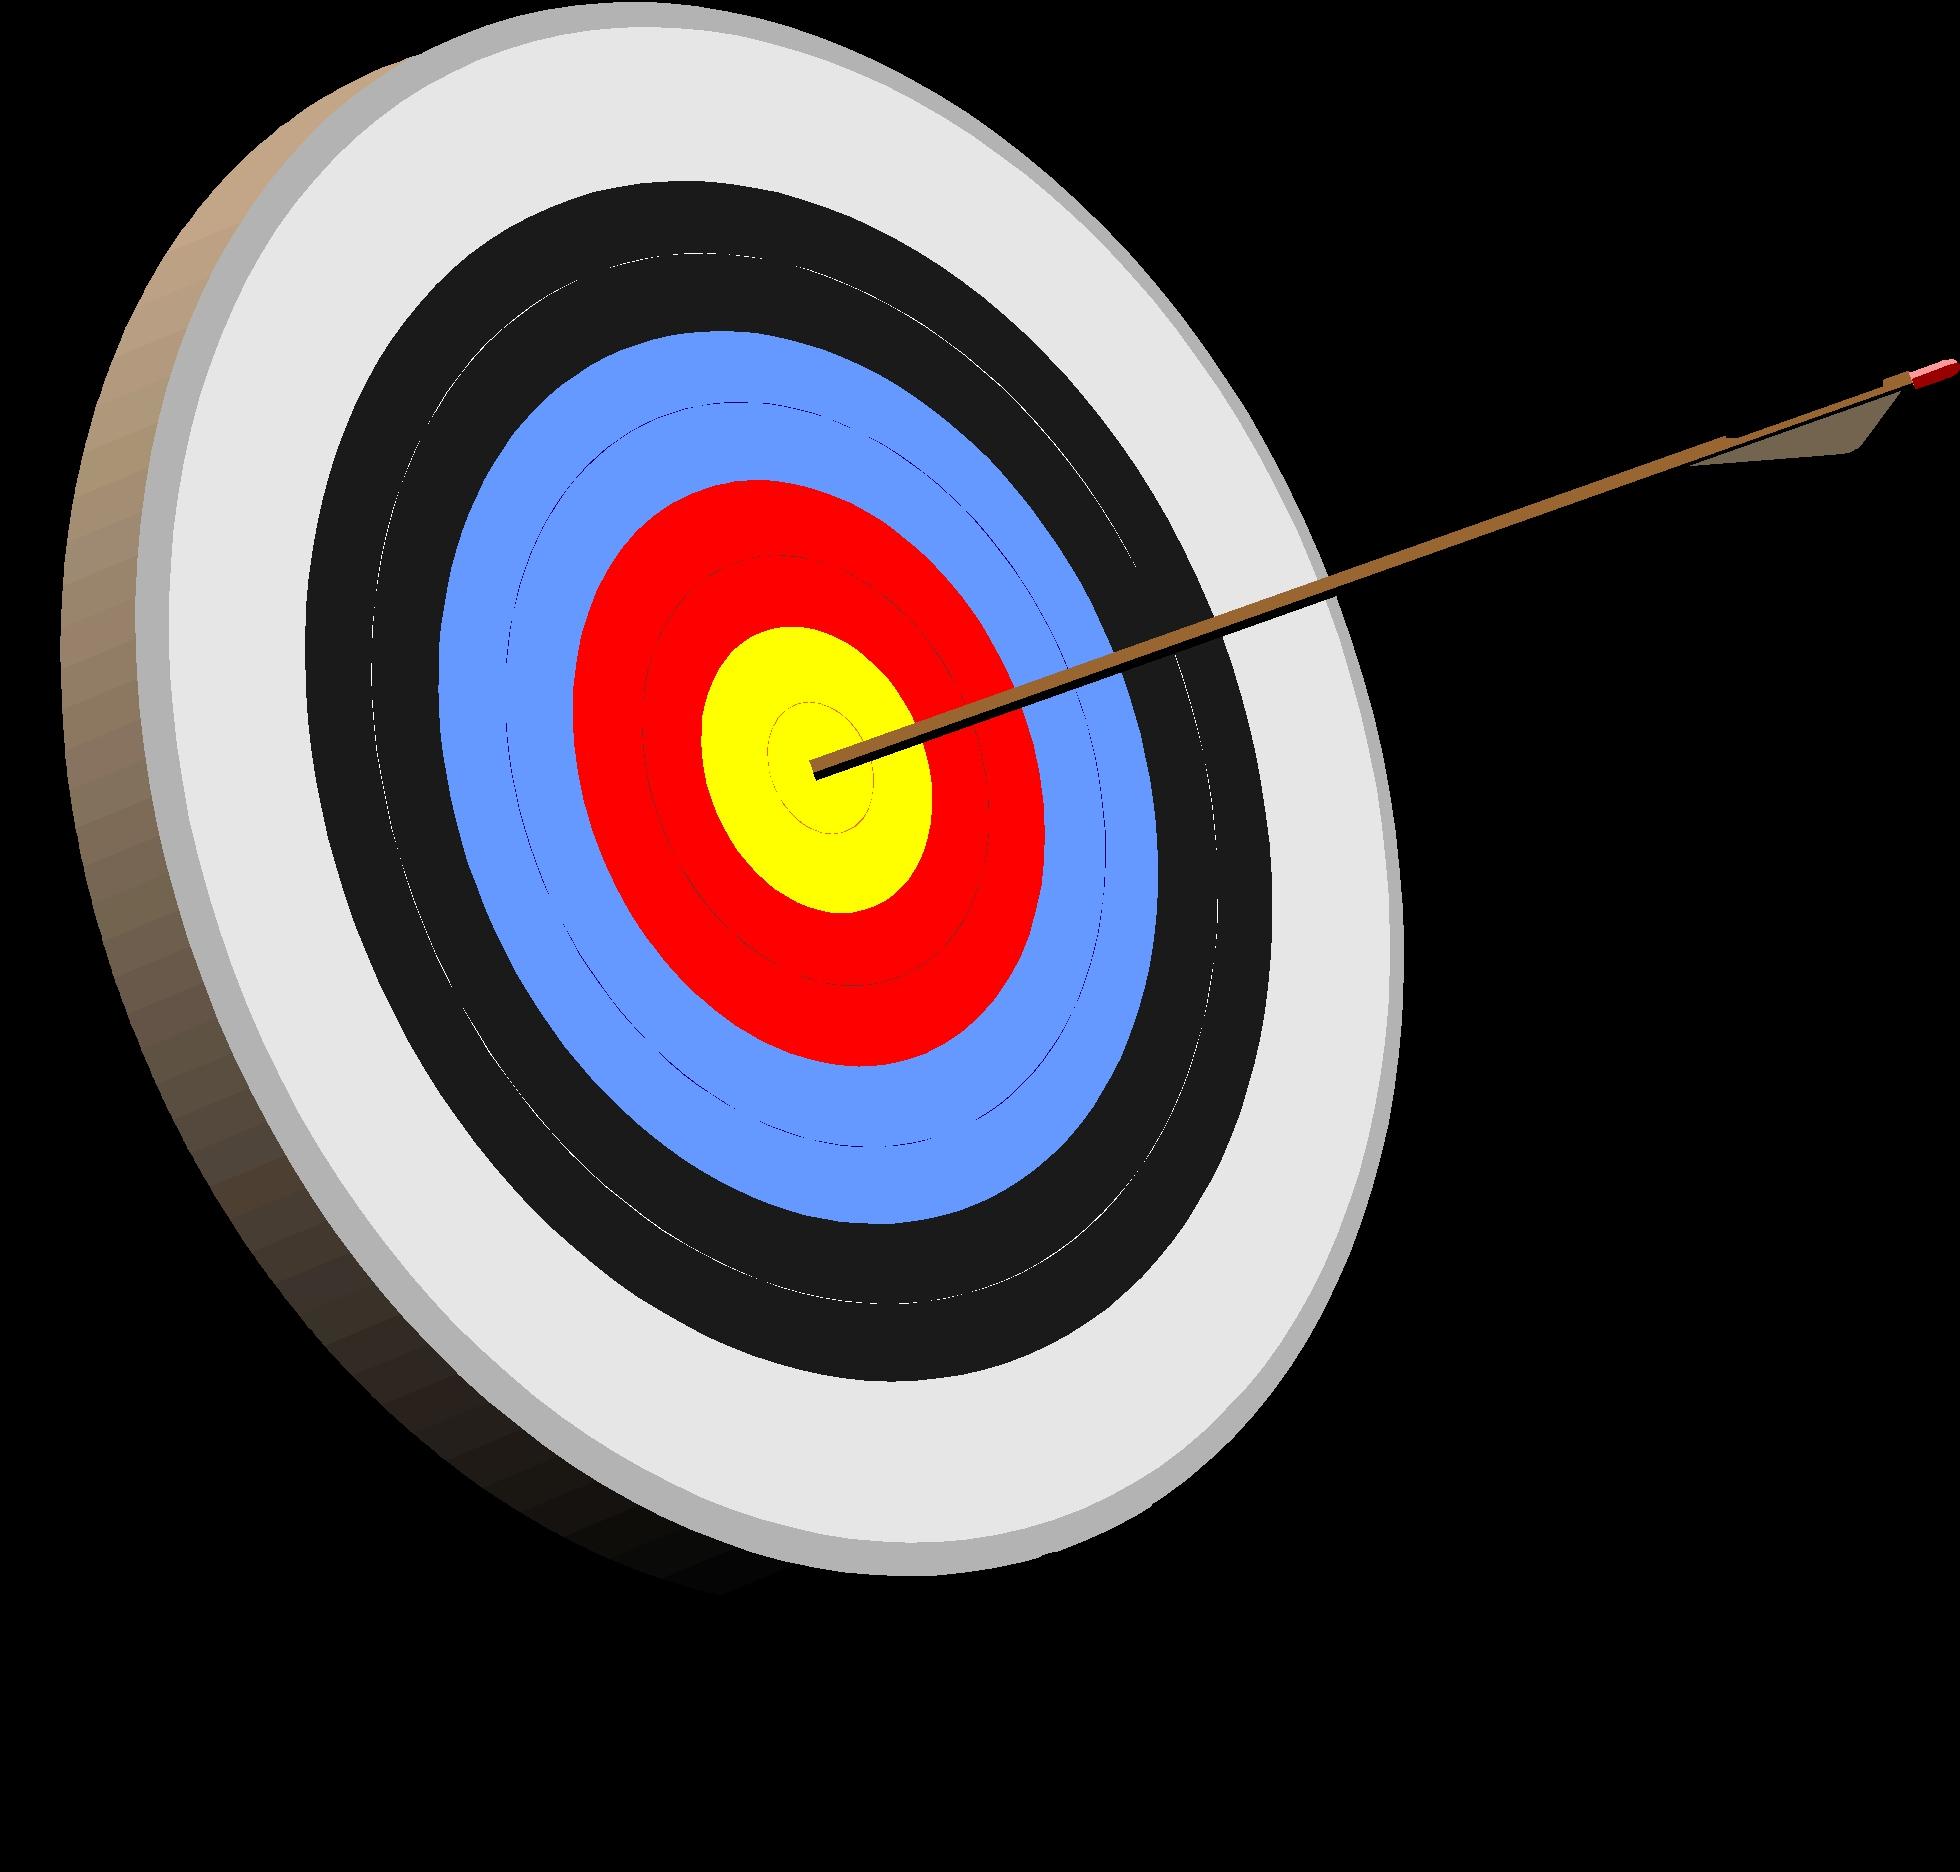 Free cliparts download clip. Archery clipart archery bullseye